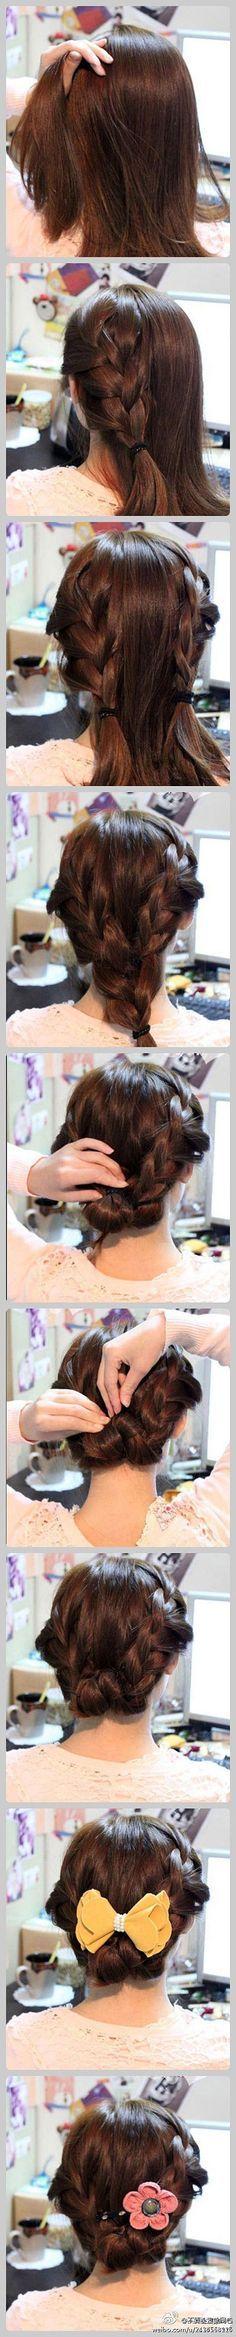 Trenzas para cabello corto   ActitudFEM✅